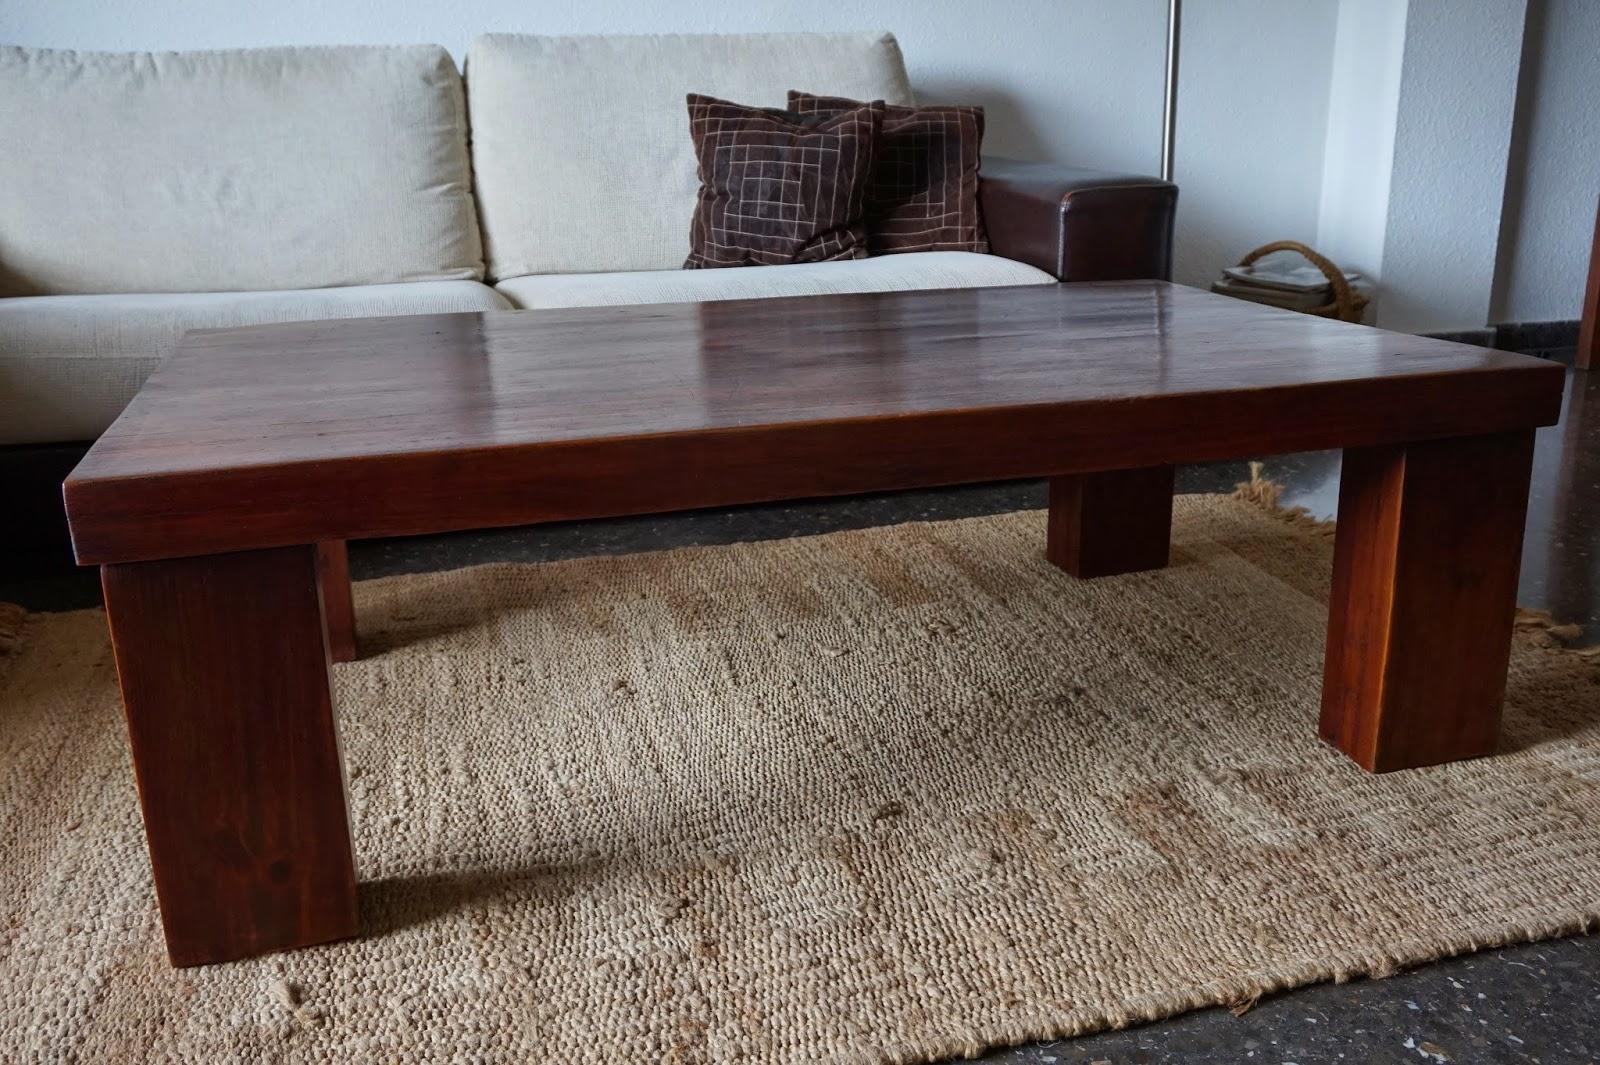 naturalis muebles ecolgicos mesa reciclada bernia